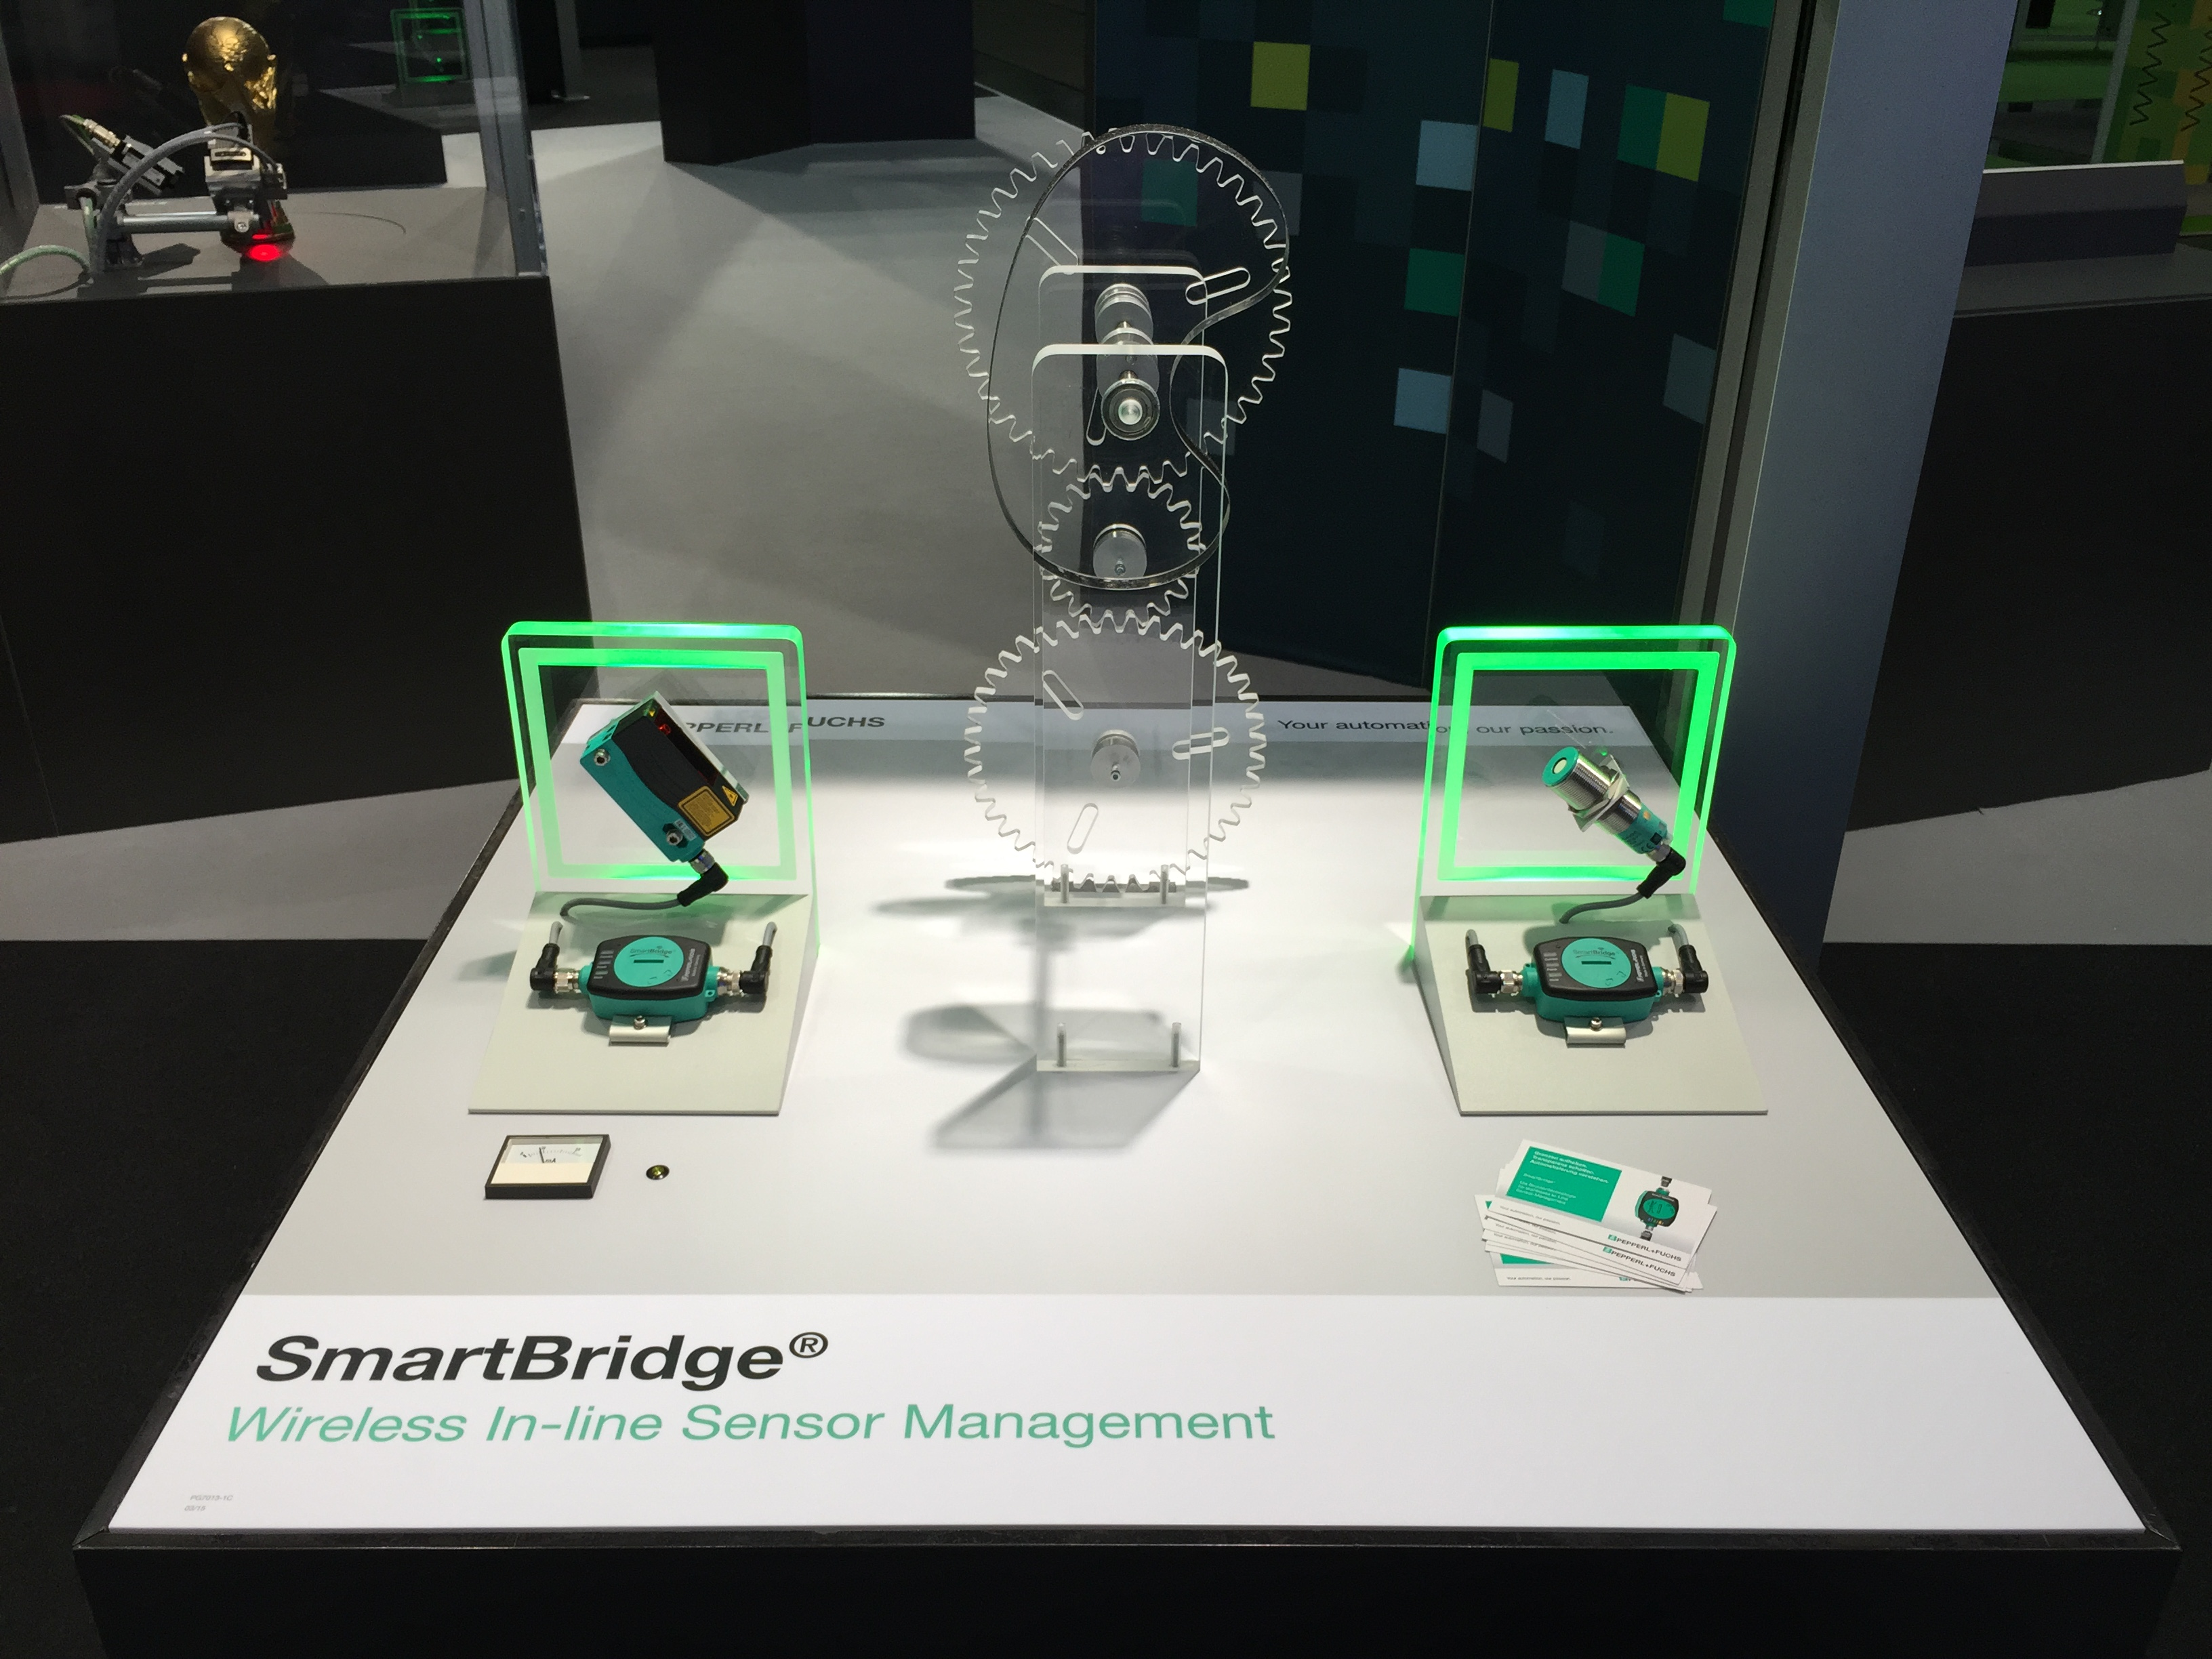 SmartBridge-Adapter und -App